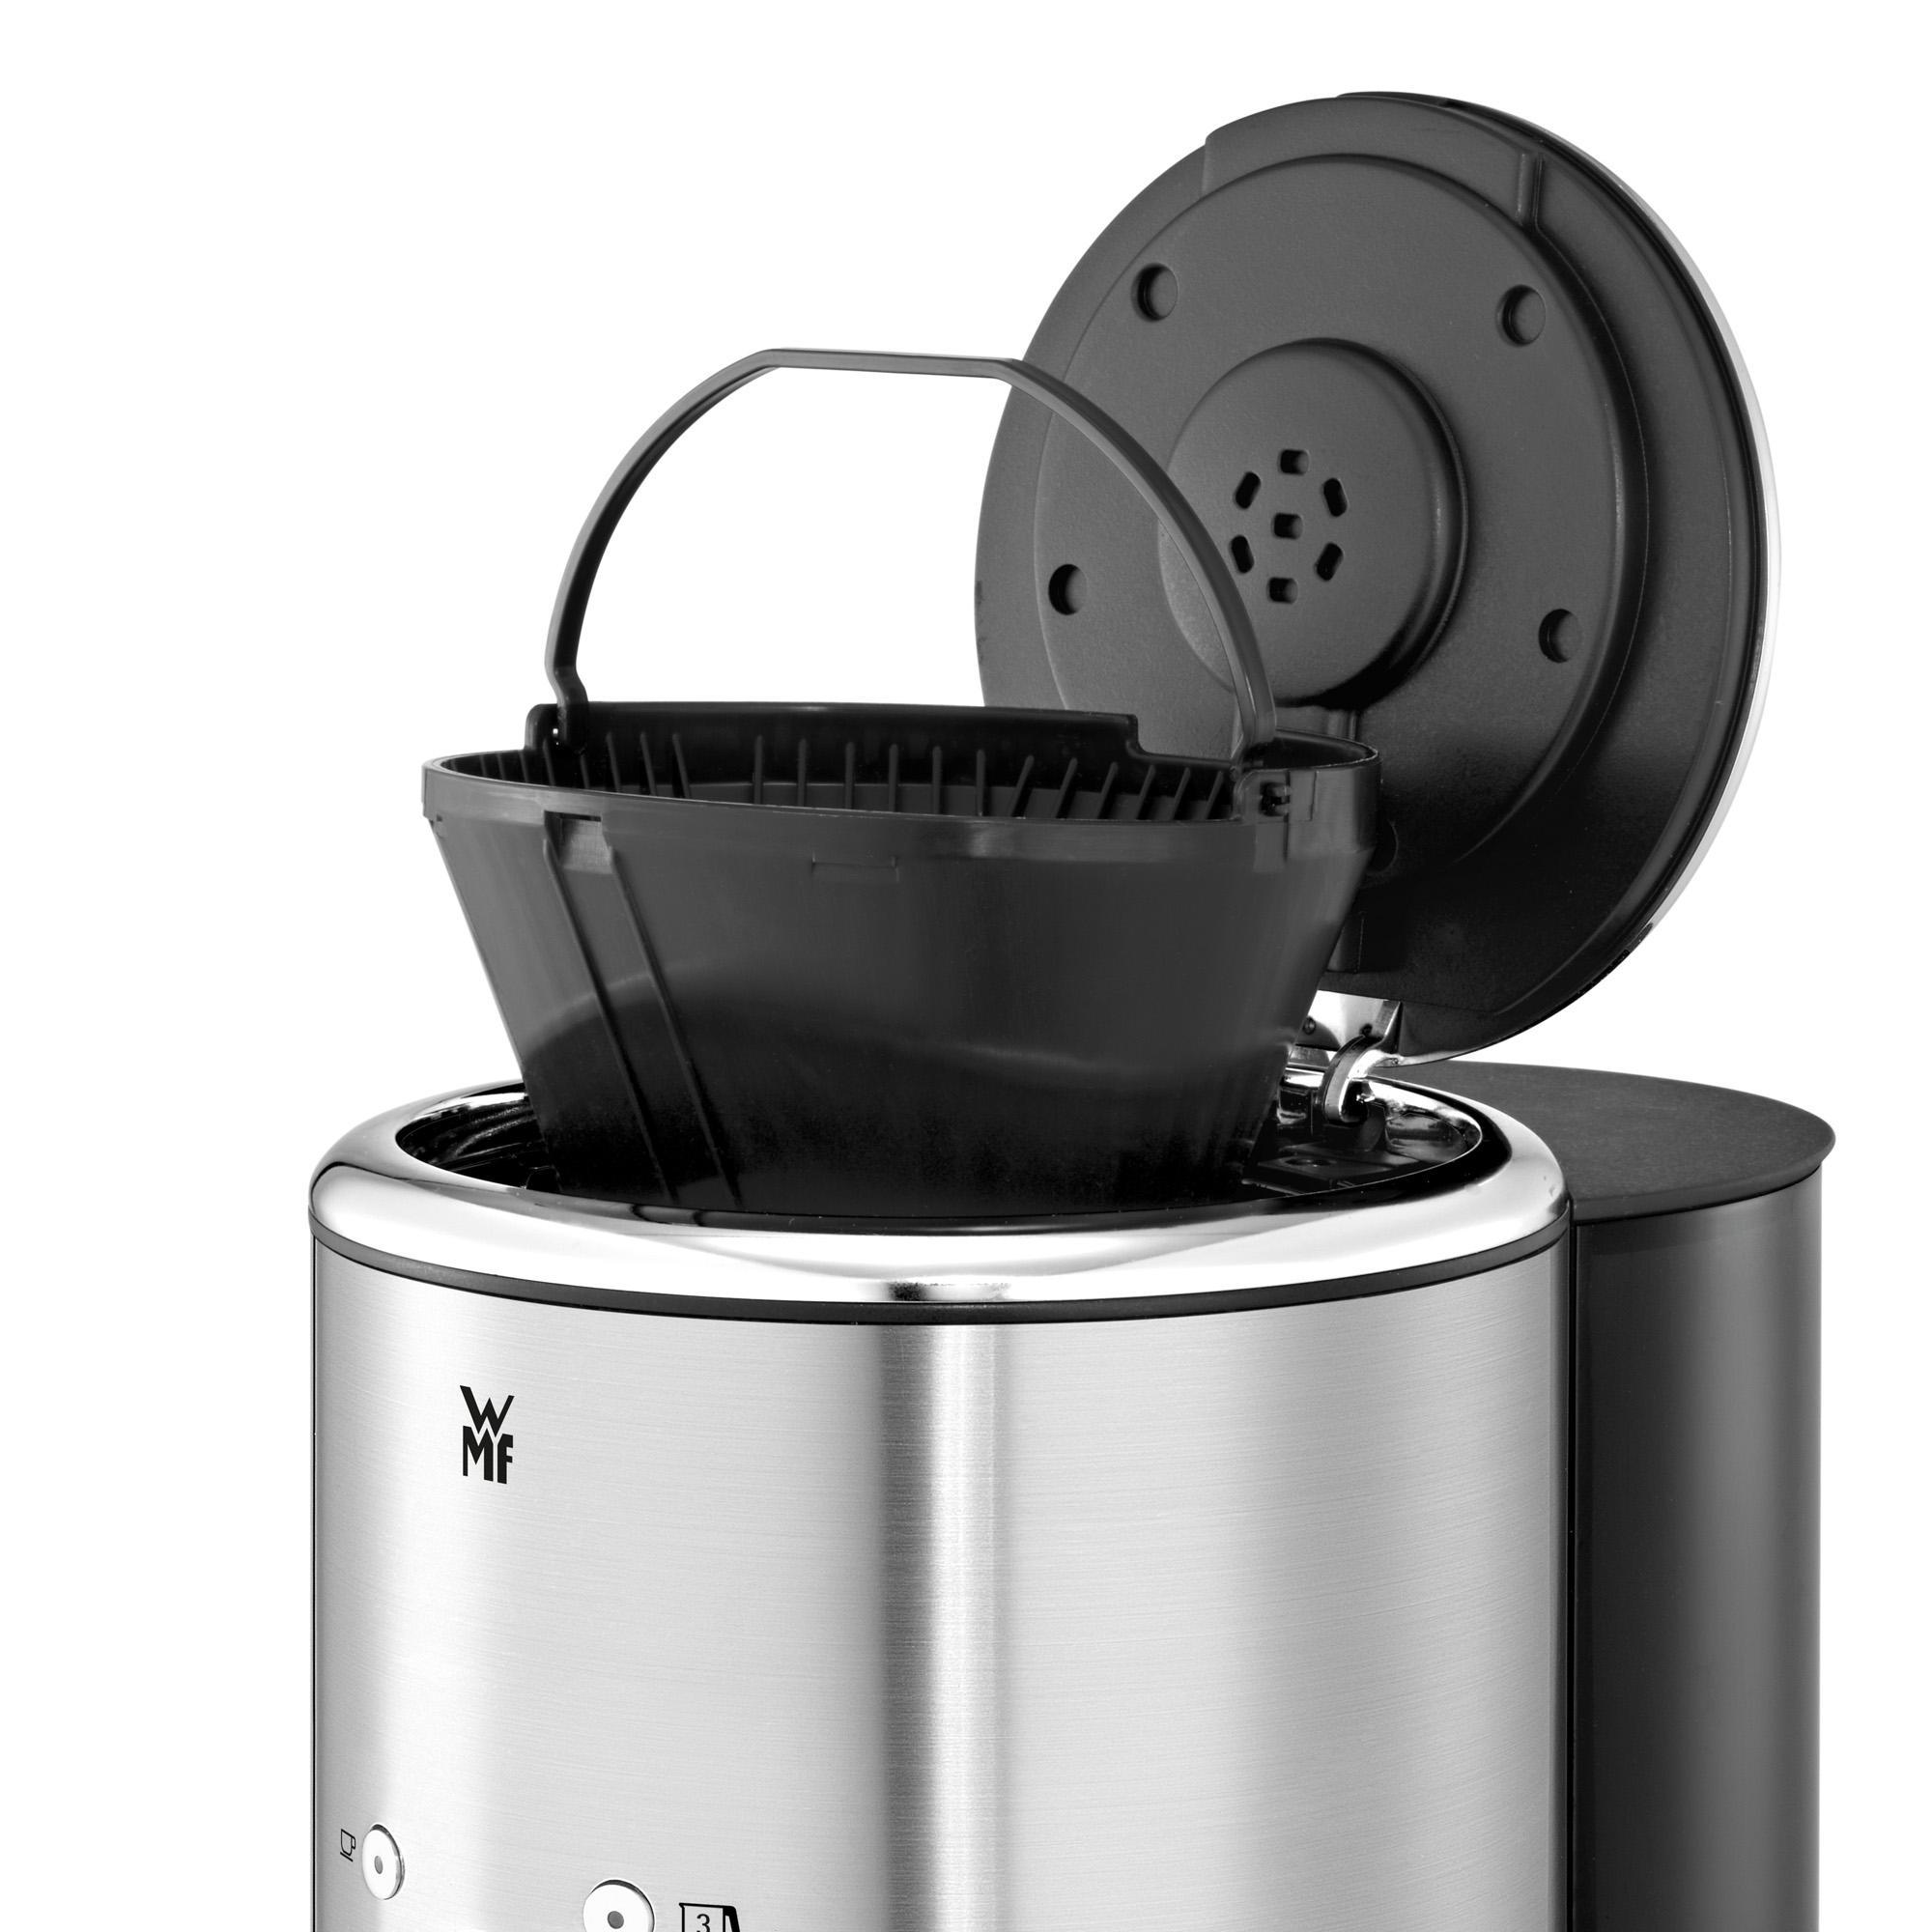 wmf k chenminis 1 tasse kaffeemaschine aromaone filterkaffeemaschine glaskanne 1 4. Black Bedroom Furniture Sets. Home Design Ideas